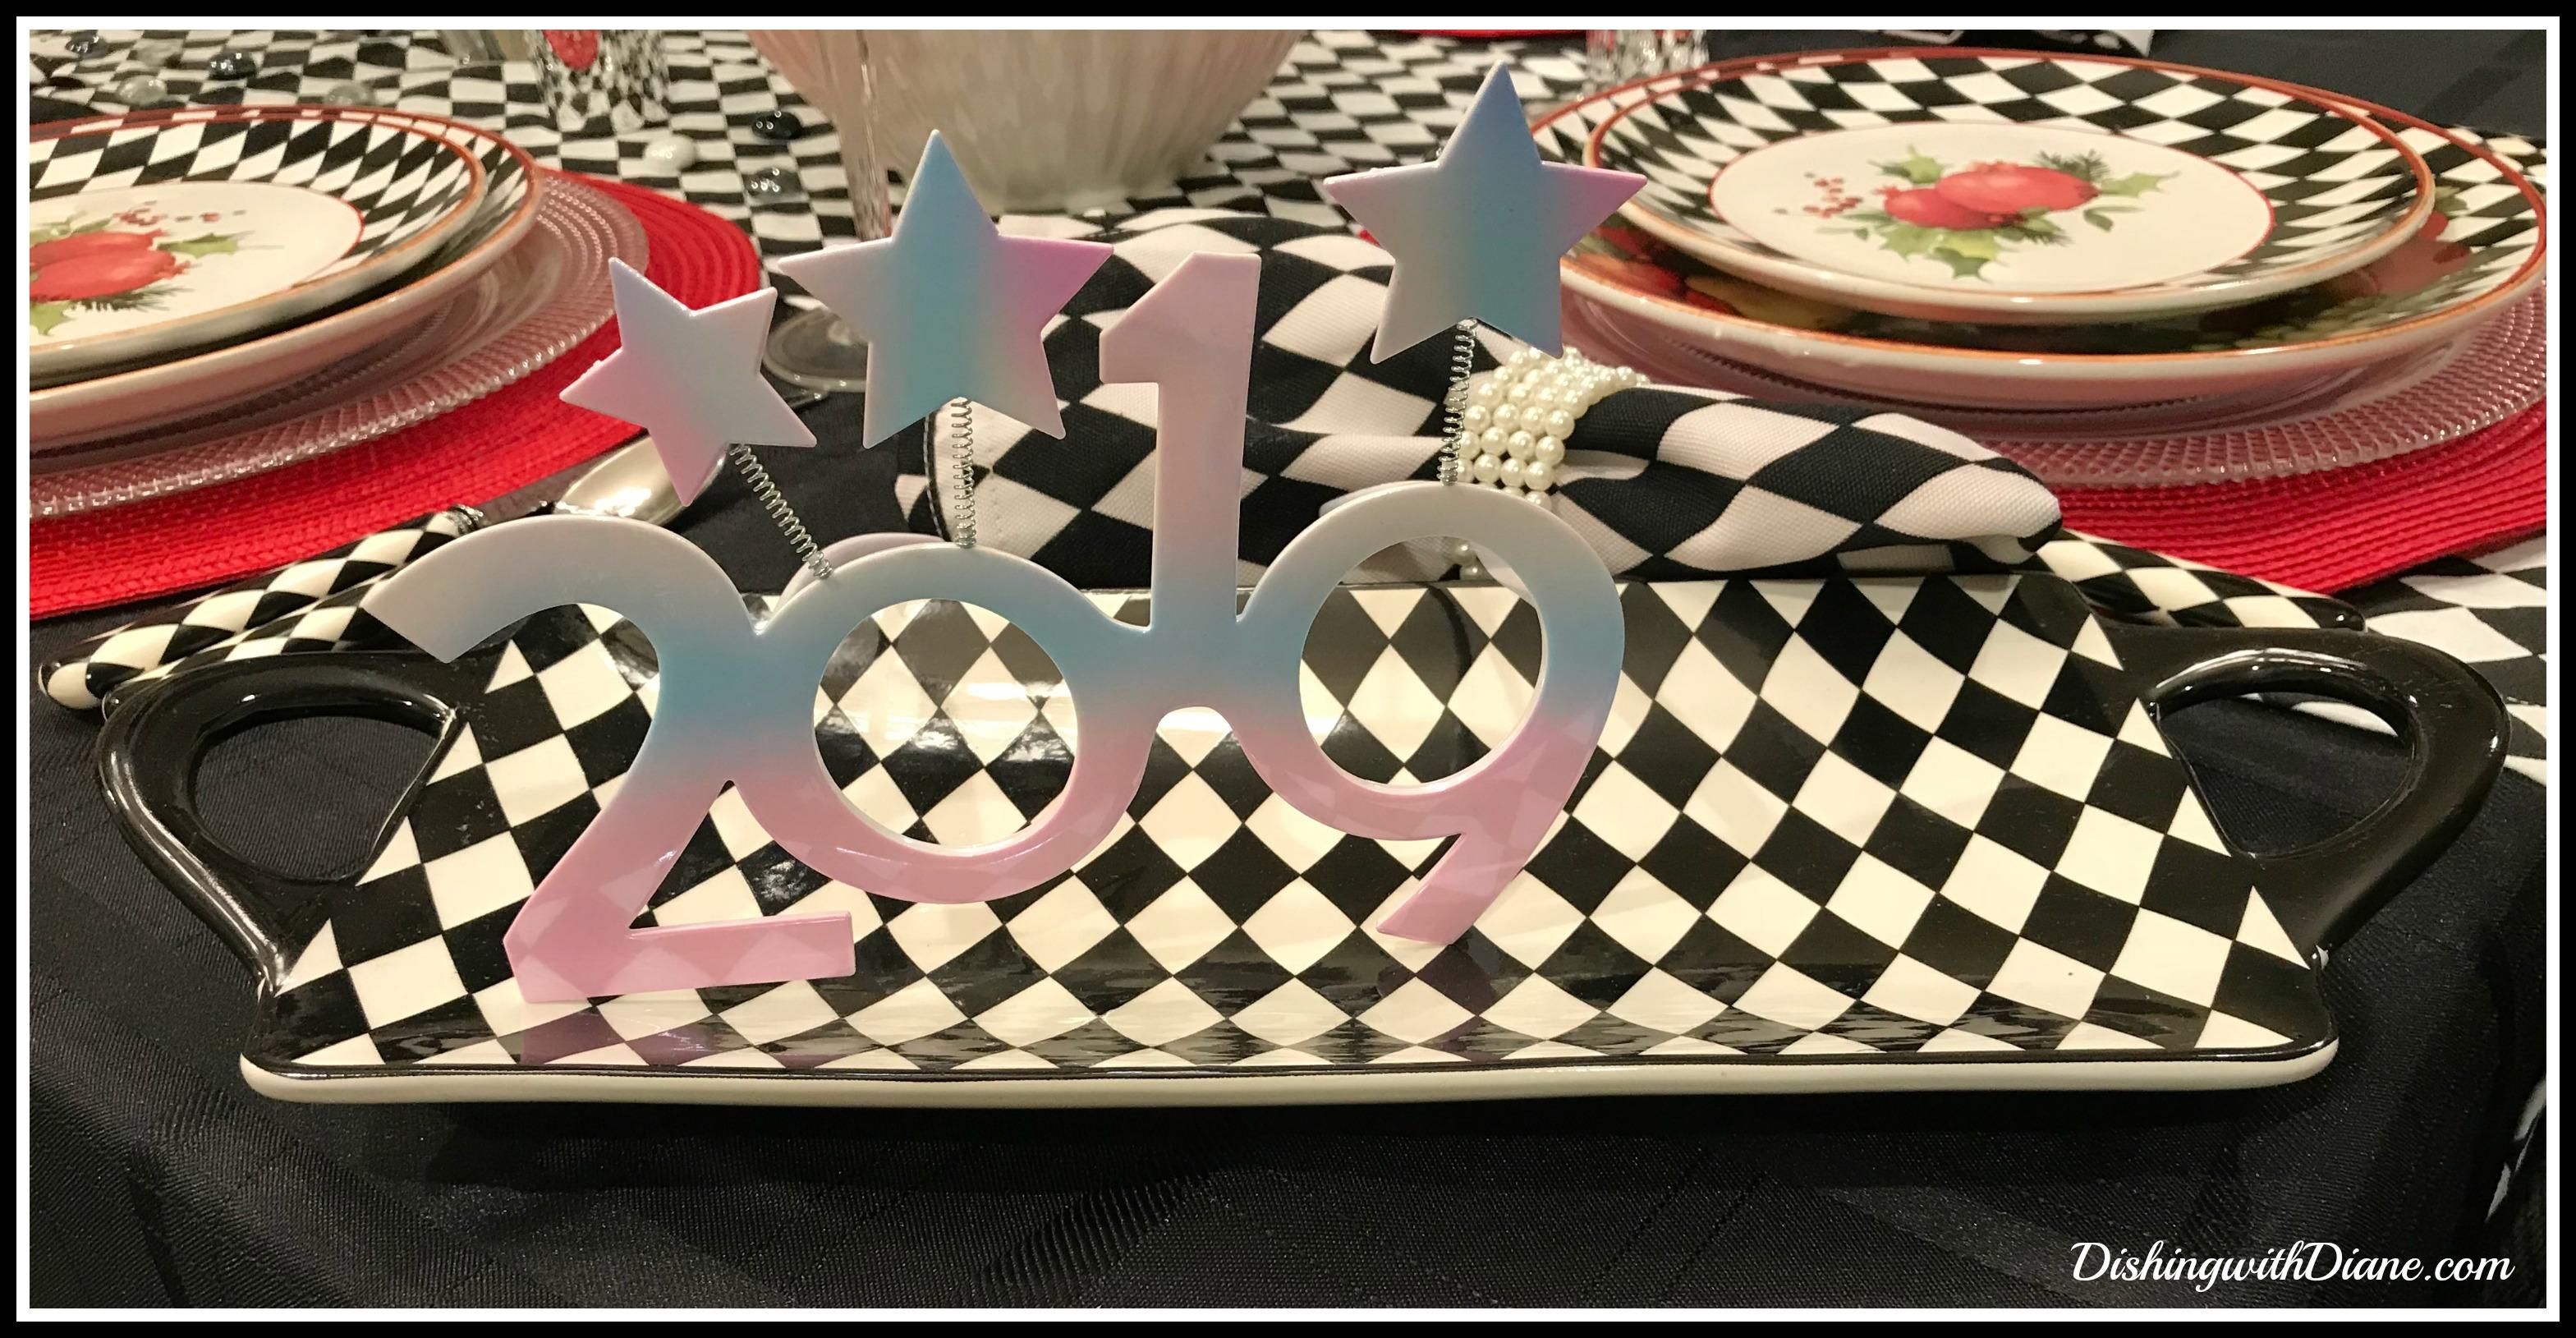 photo jan 25, 5 53 39 pm rectangular tray